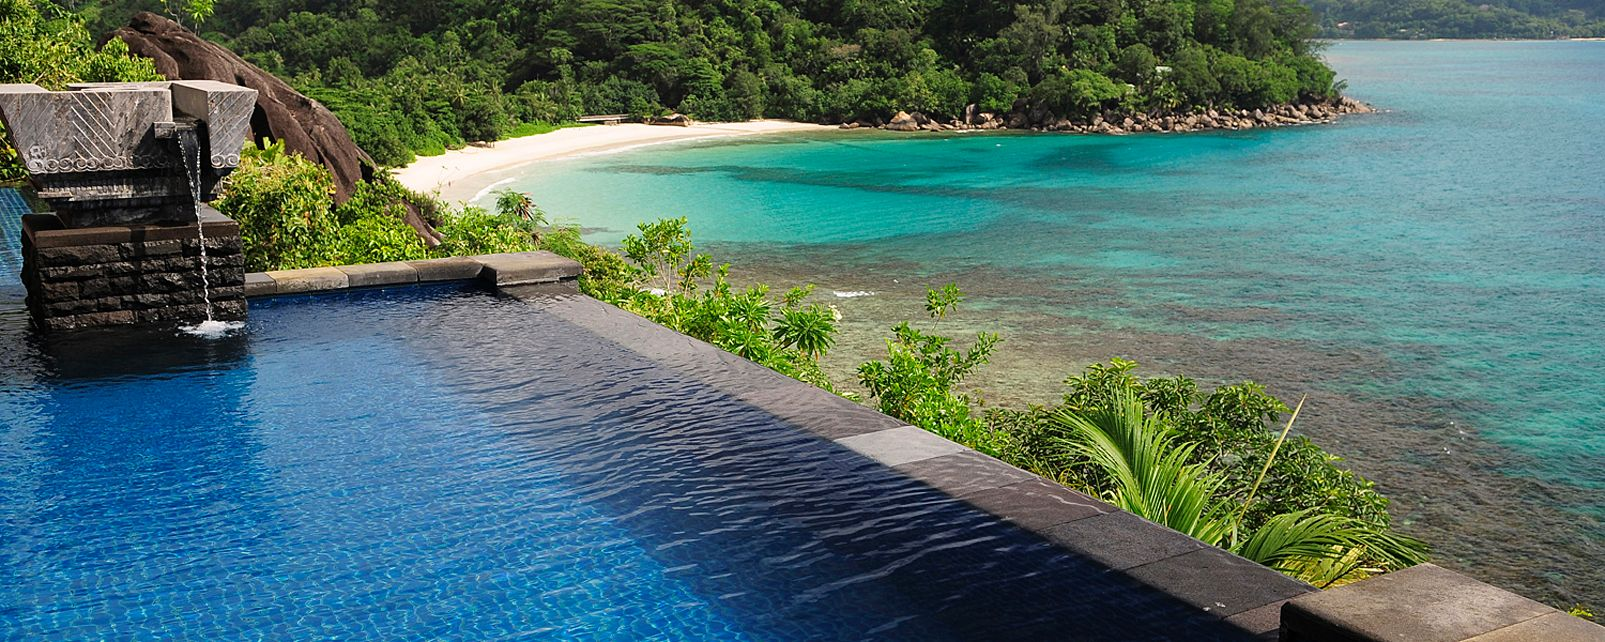 Hotel Maïa Luxury Resort & Spa